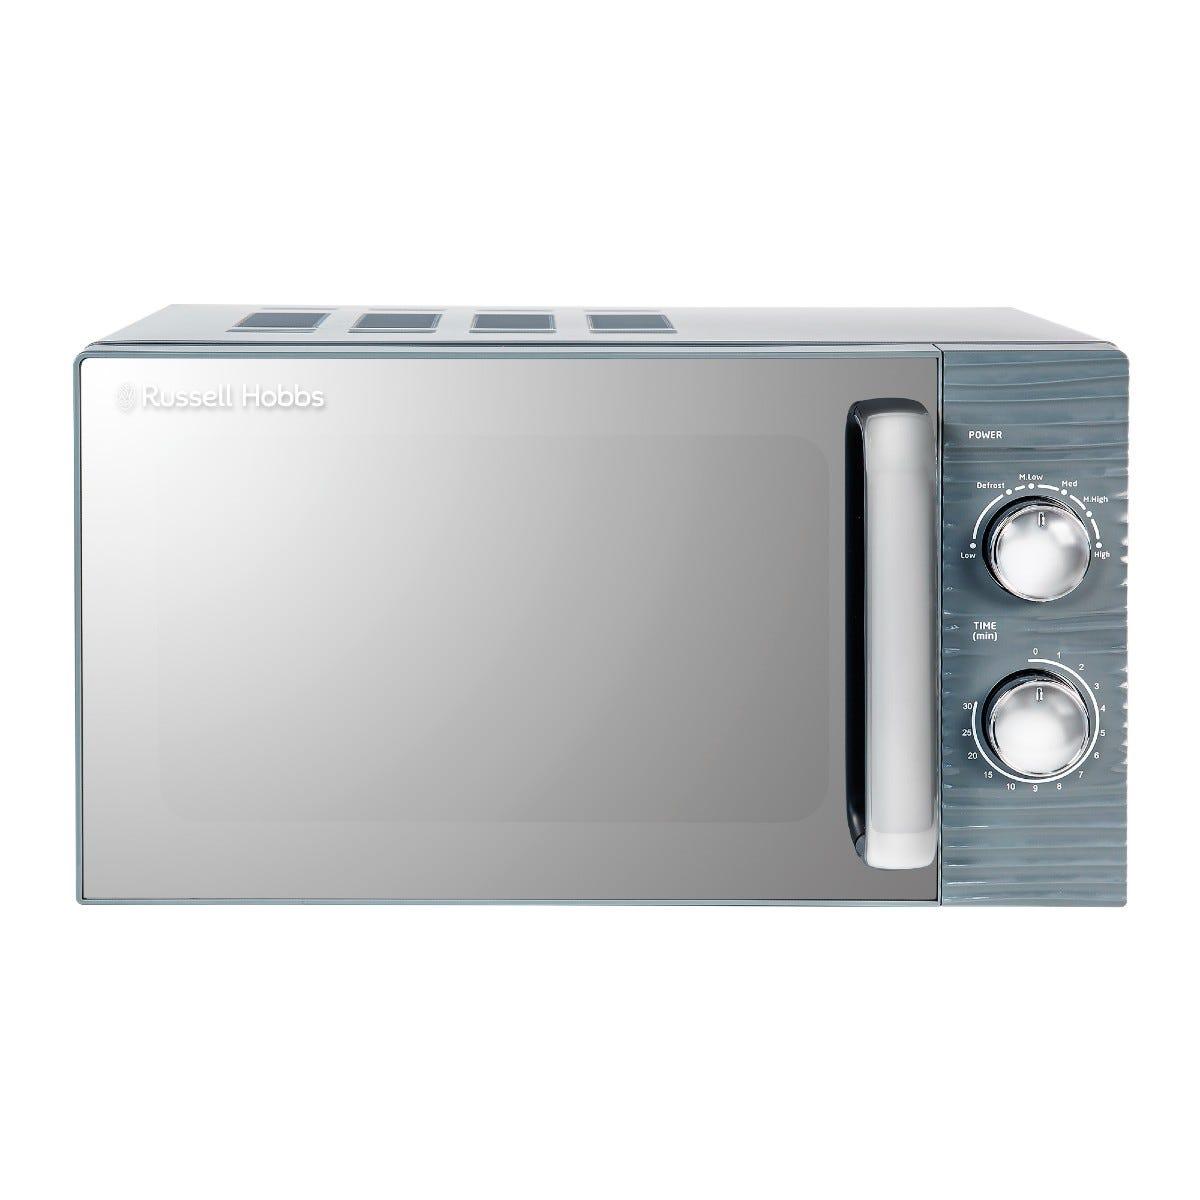 Russell Hobbs RHM1731G Inspire 17L 700W Manual Microwave - Grey